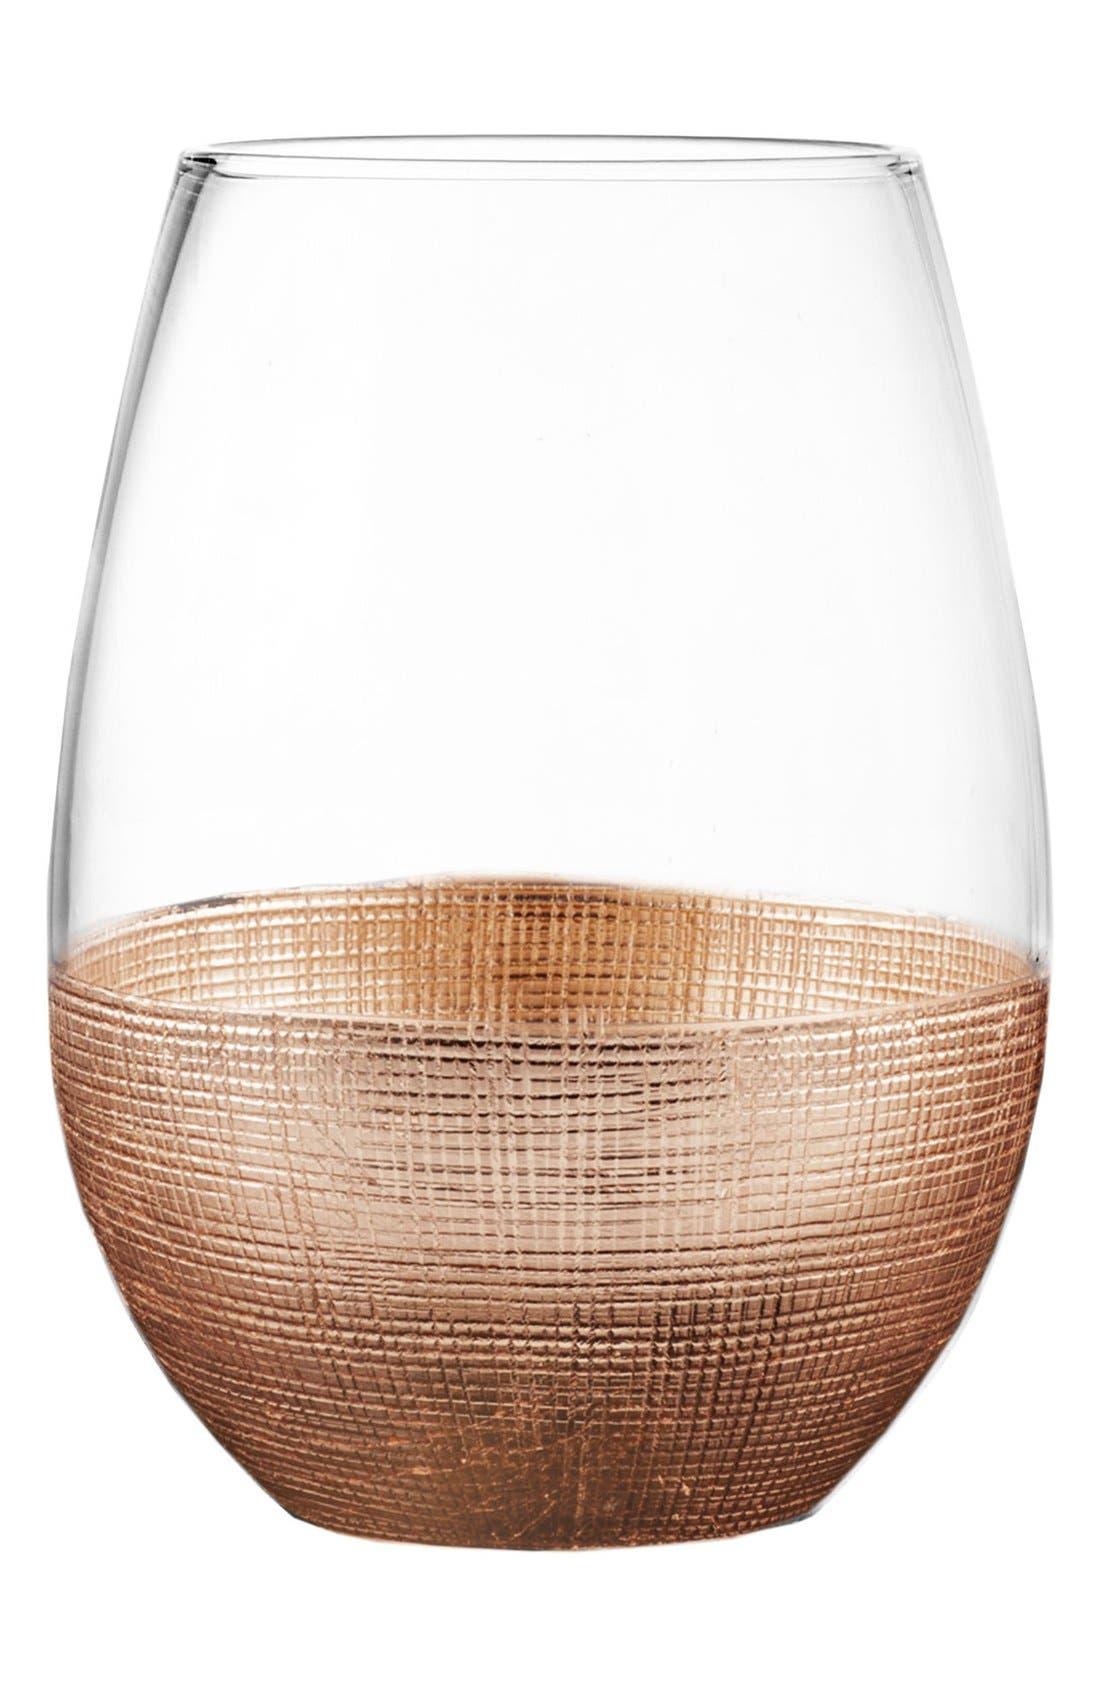 Main Image - American Atelier Linen Set of 4 Stemless Wine Glasses